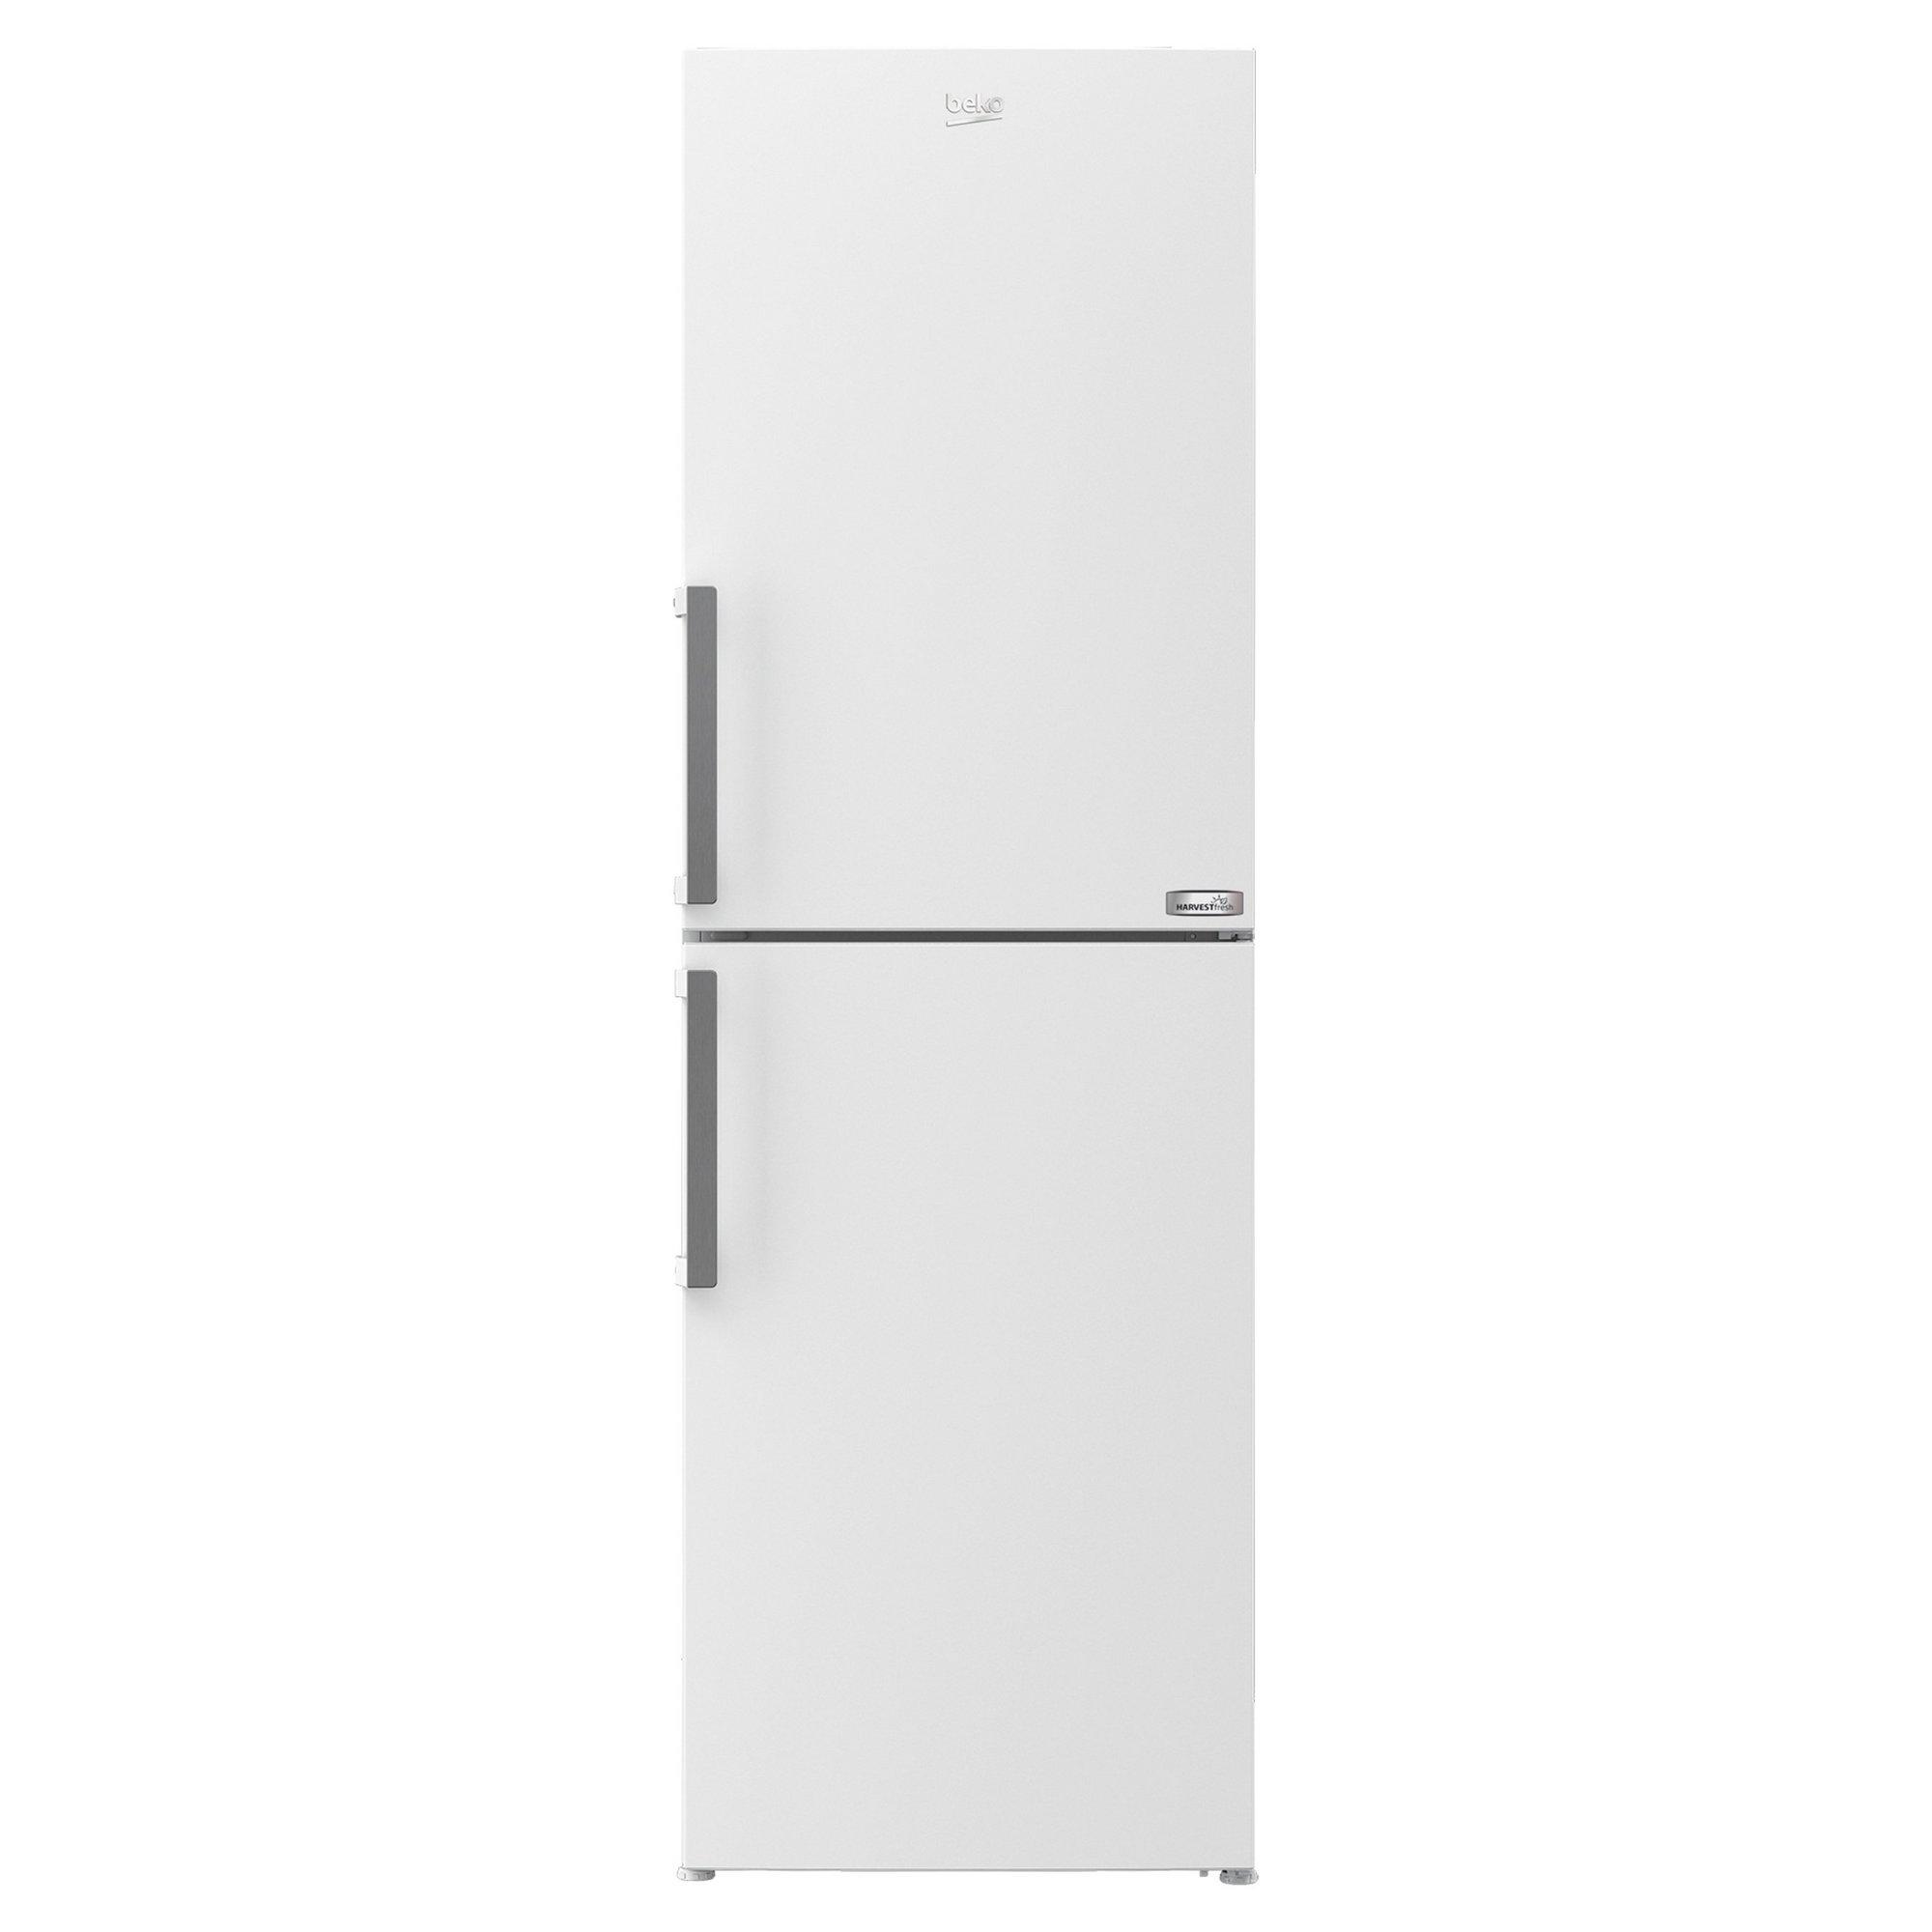 Image of Beko 191/60cm Frost Free Fridge Freezer